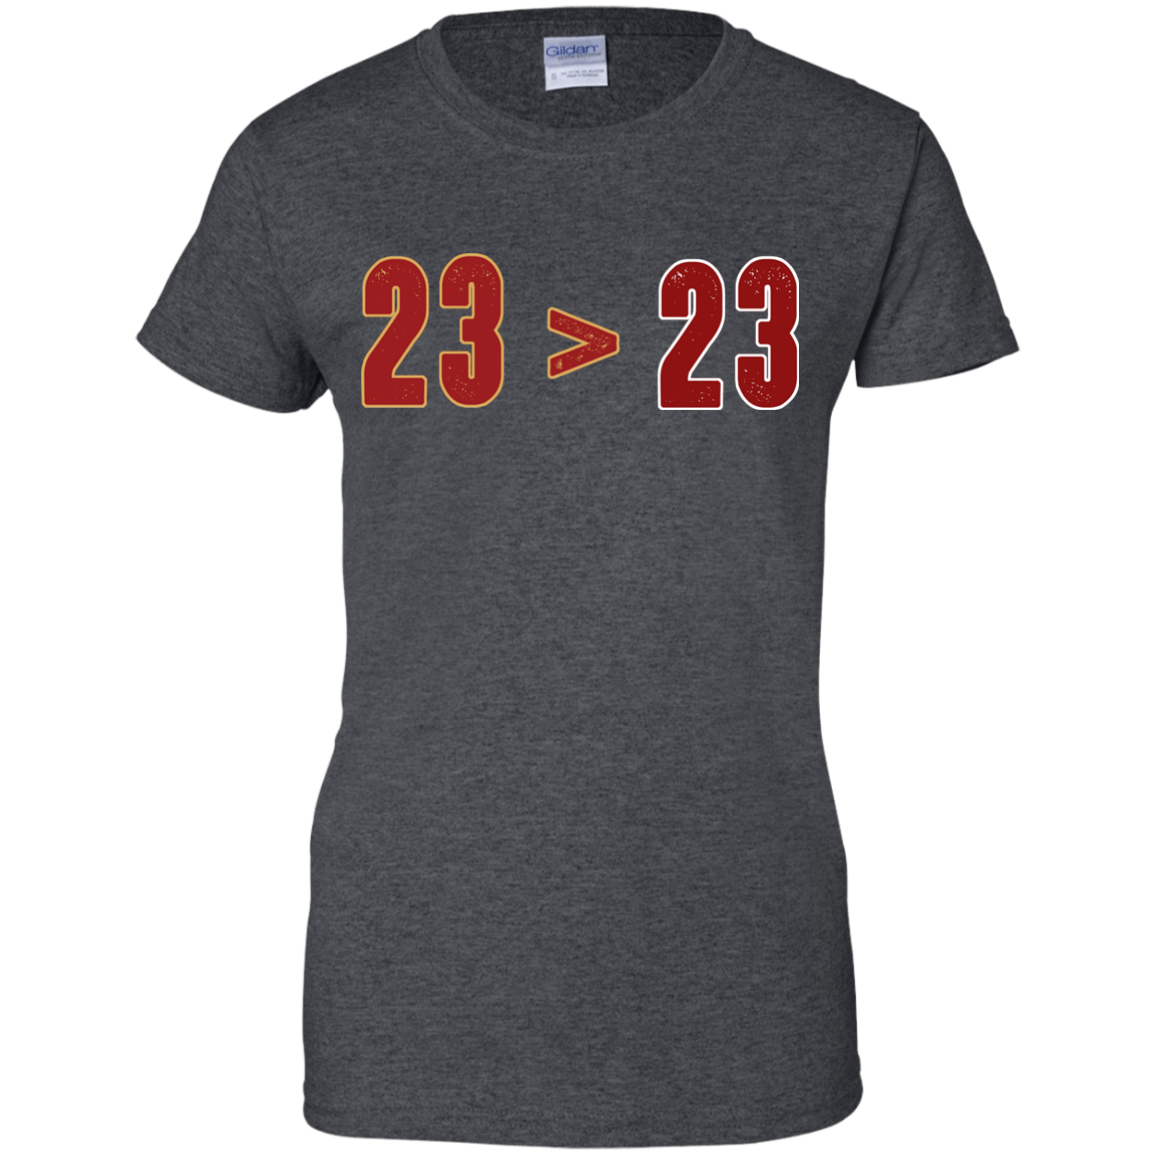 official photos c4416 71c0d 23 Greater than 23 T-shirt, LeBron Greater Than Jordan T-shirt,Tank, Hoodie